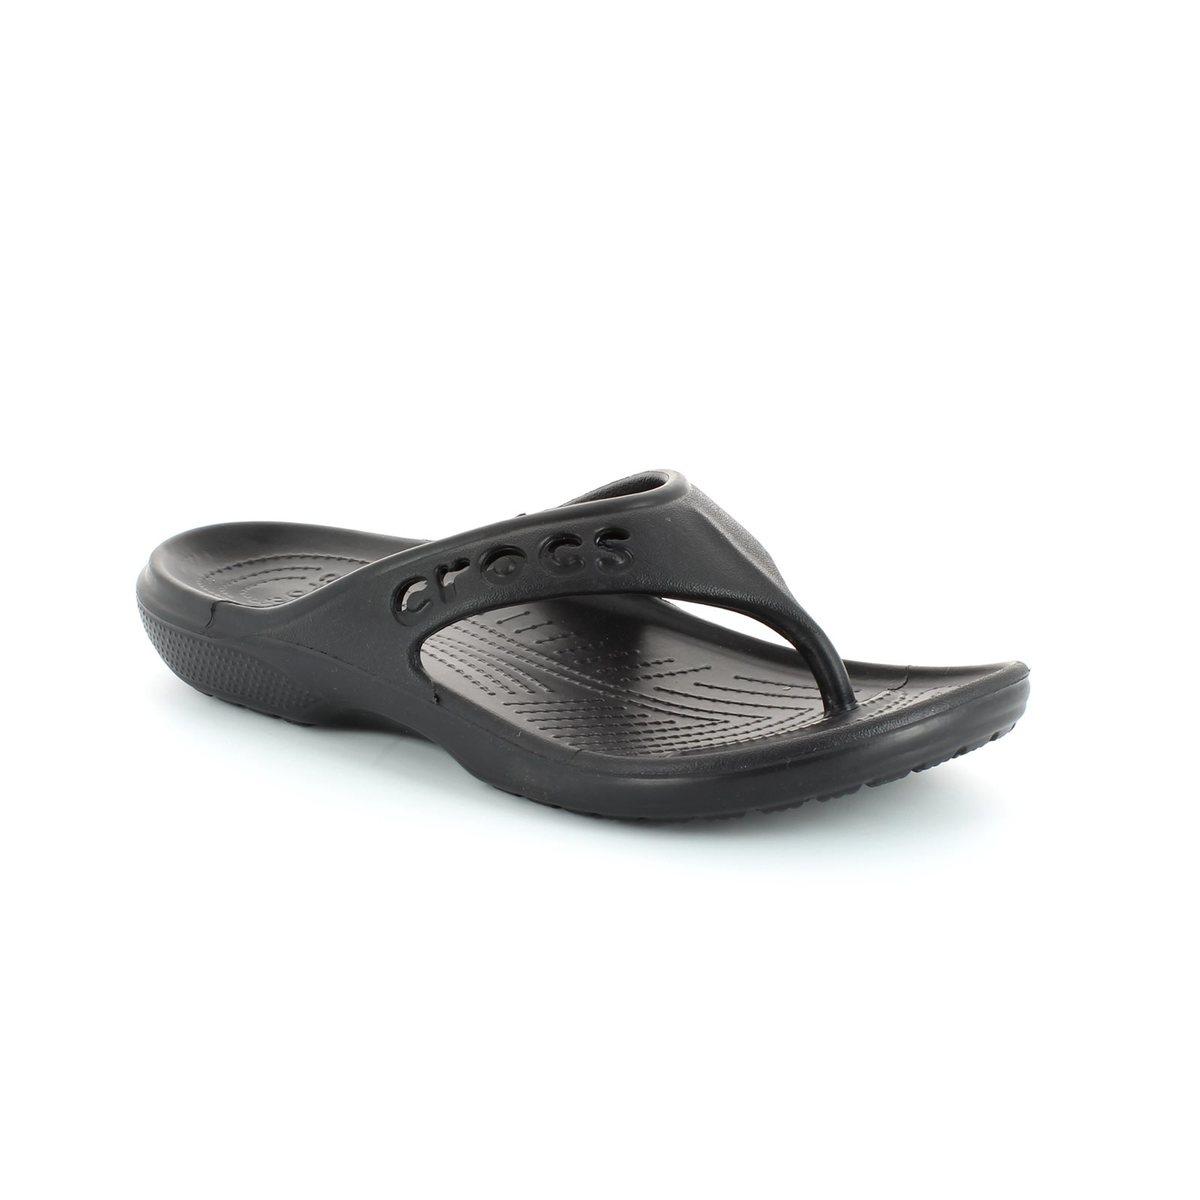 7faa8b7ba792a Crocs Mens  amp  Womens - Black - 11999 001 BAYA FLIP